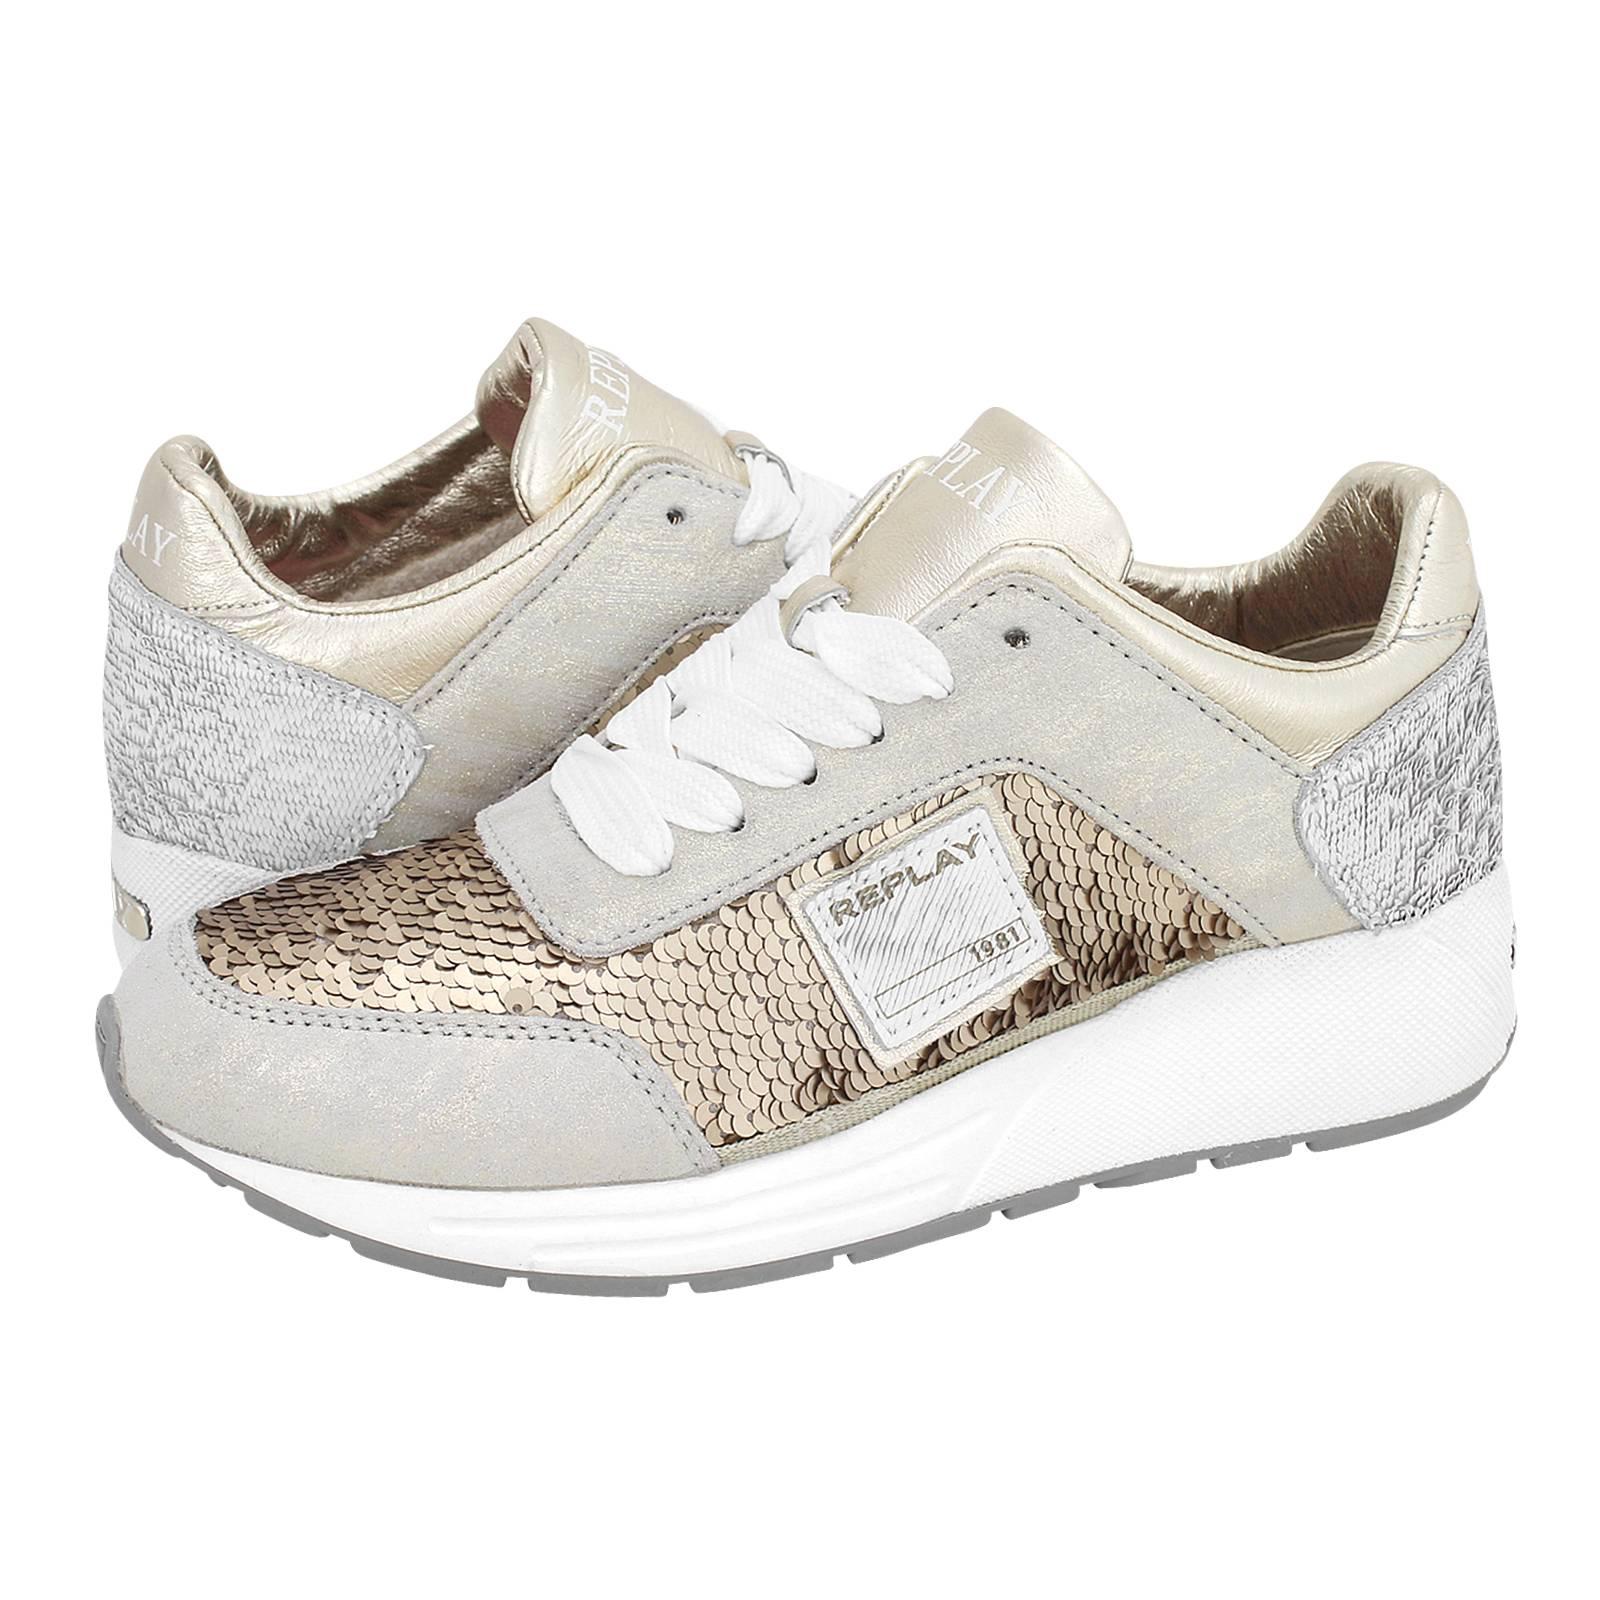 Chill - Γυναικεία παπούτσια casual Replay από καστορι a9c697eb831